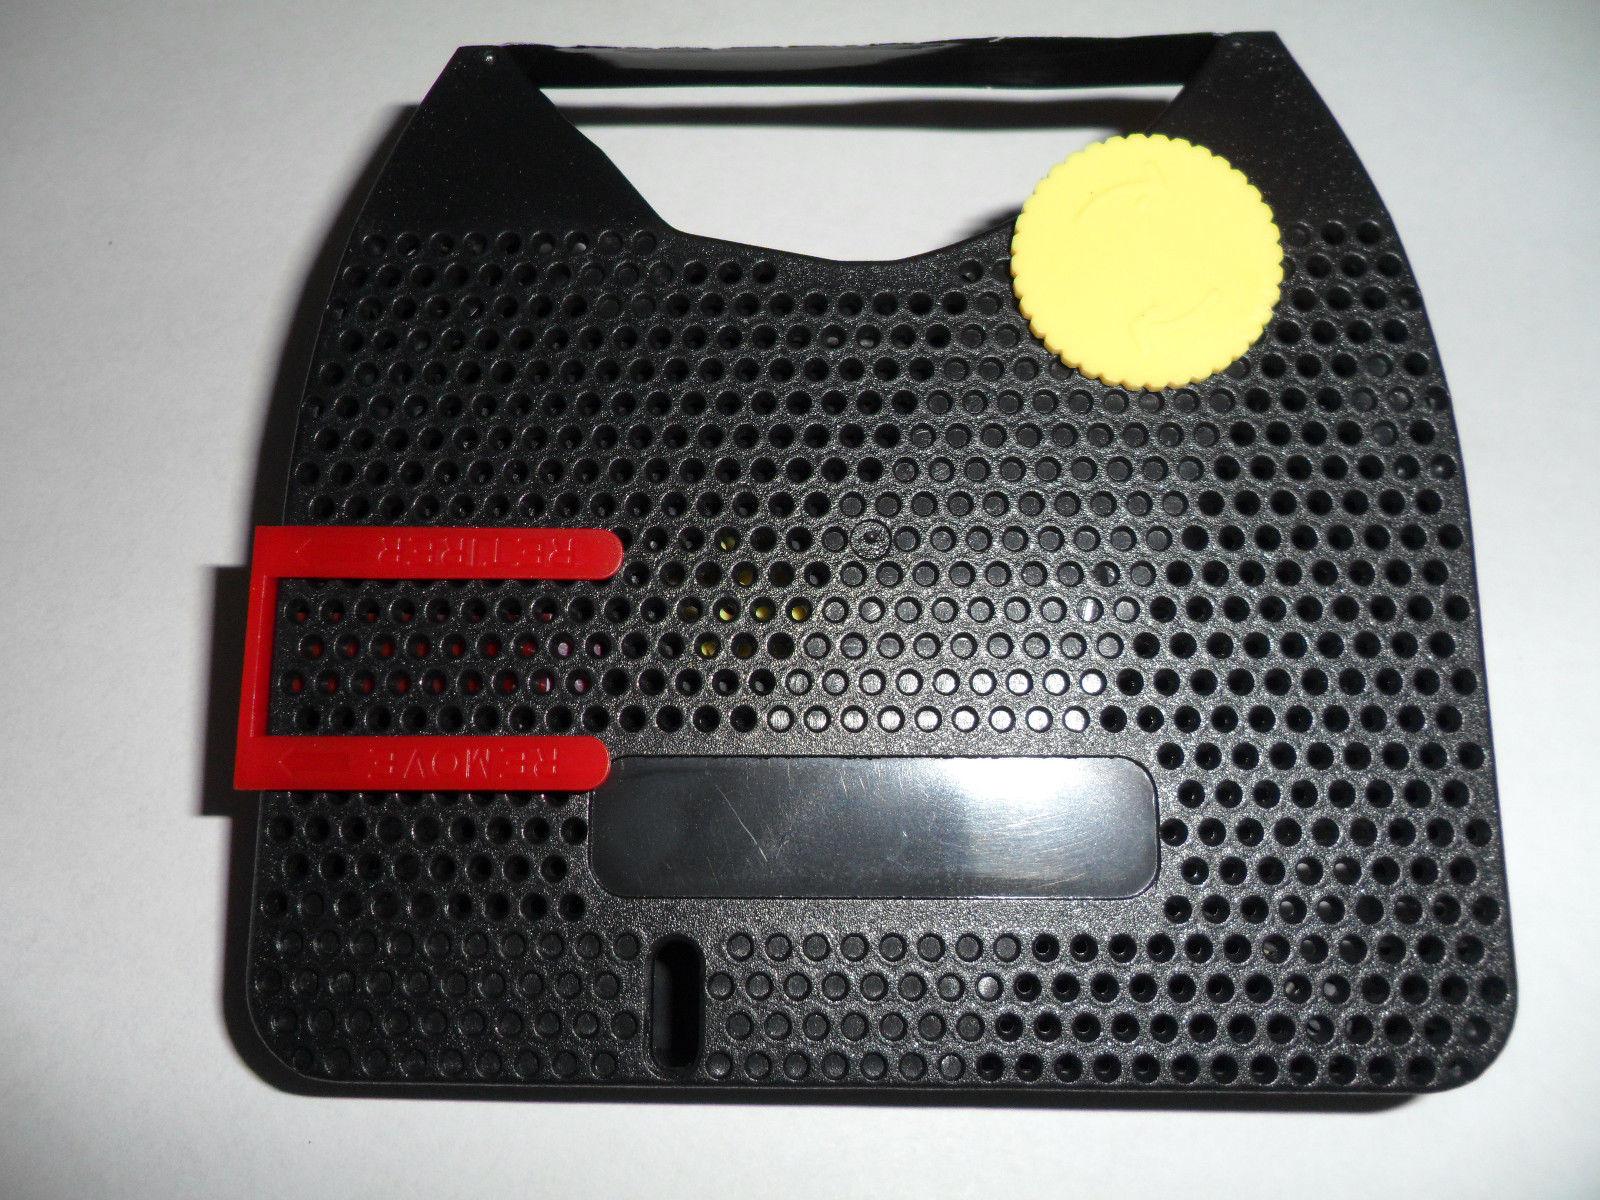 Smith Corona CXL5200/Deville 125 Typewriter Ribbon (2 Pack) Replaces 21000